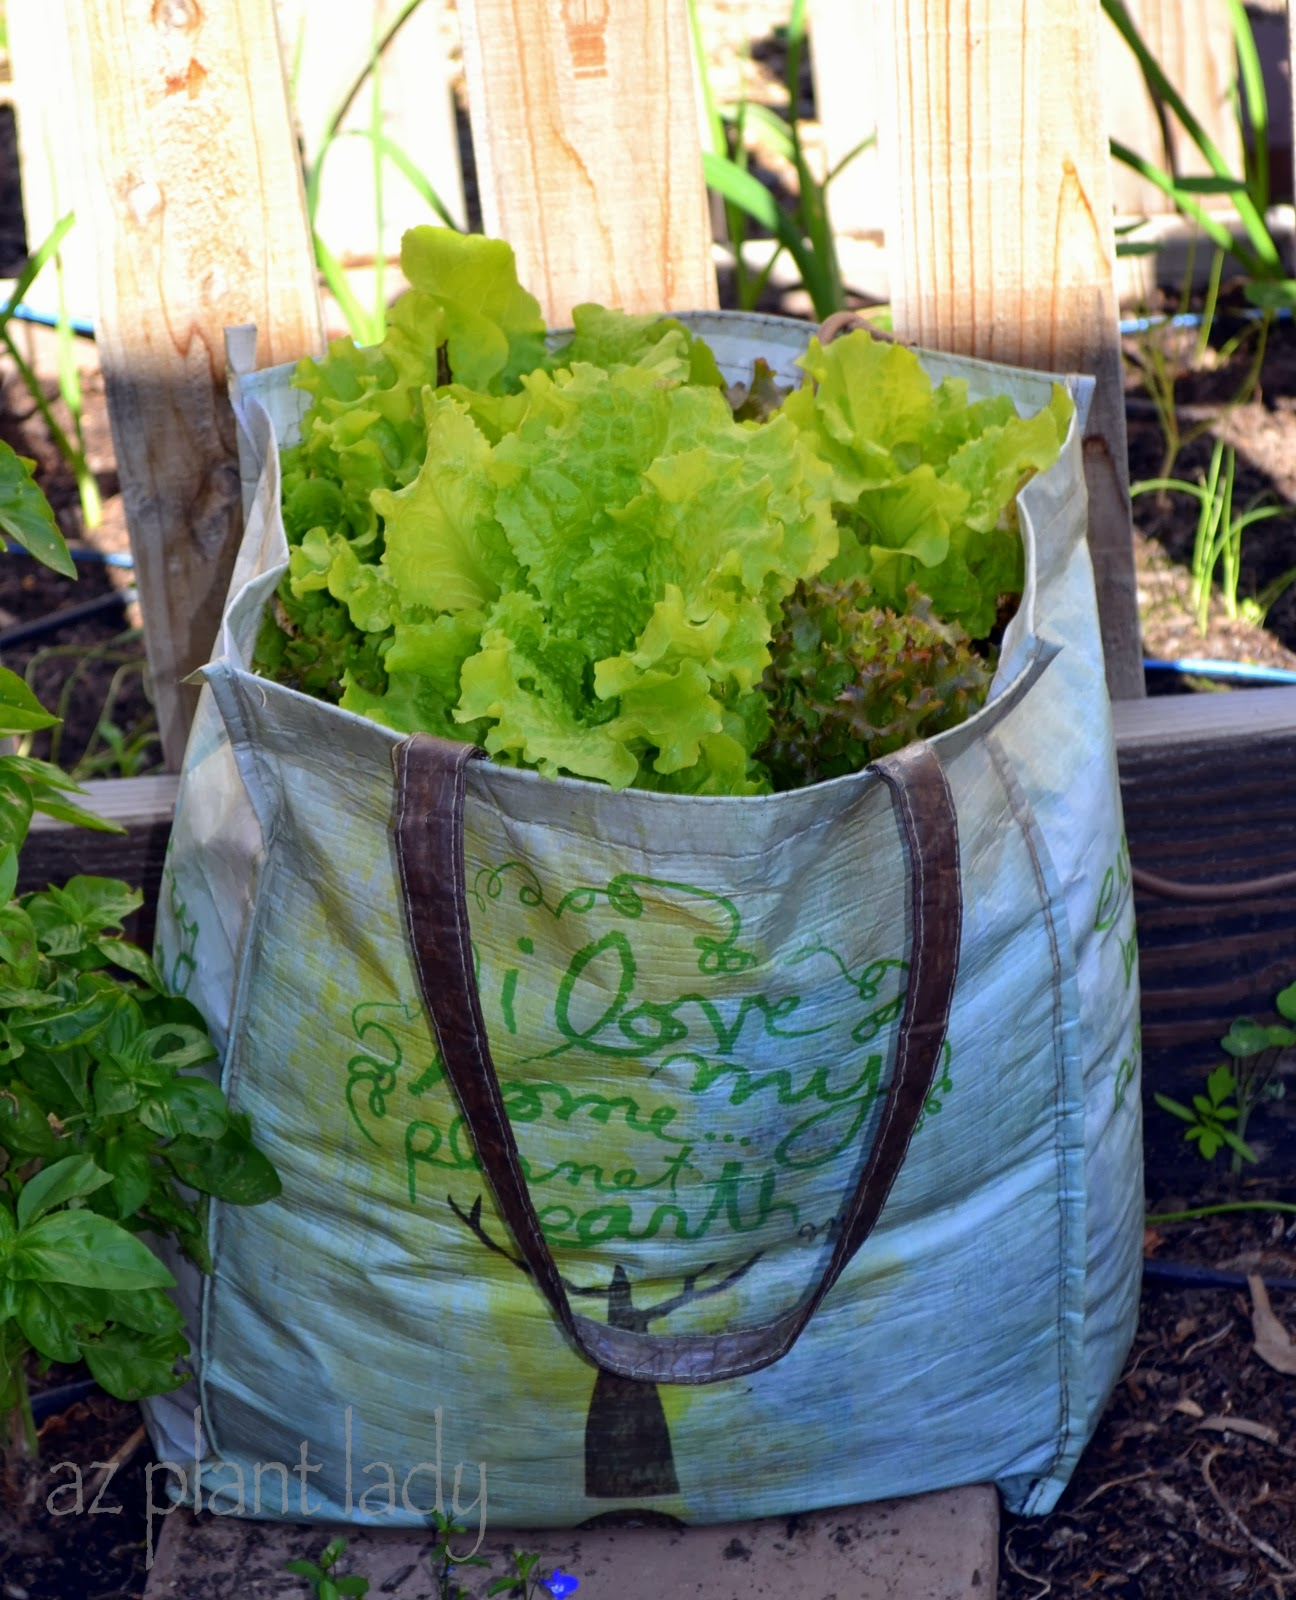 Start Your Own Lettuce Seedlings In Recycled Plastic